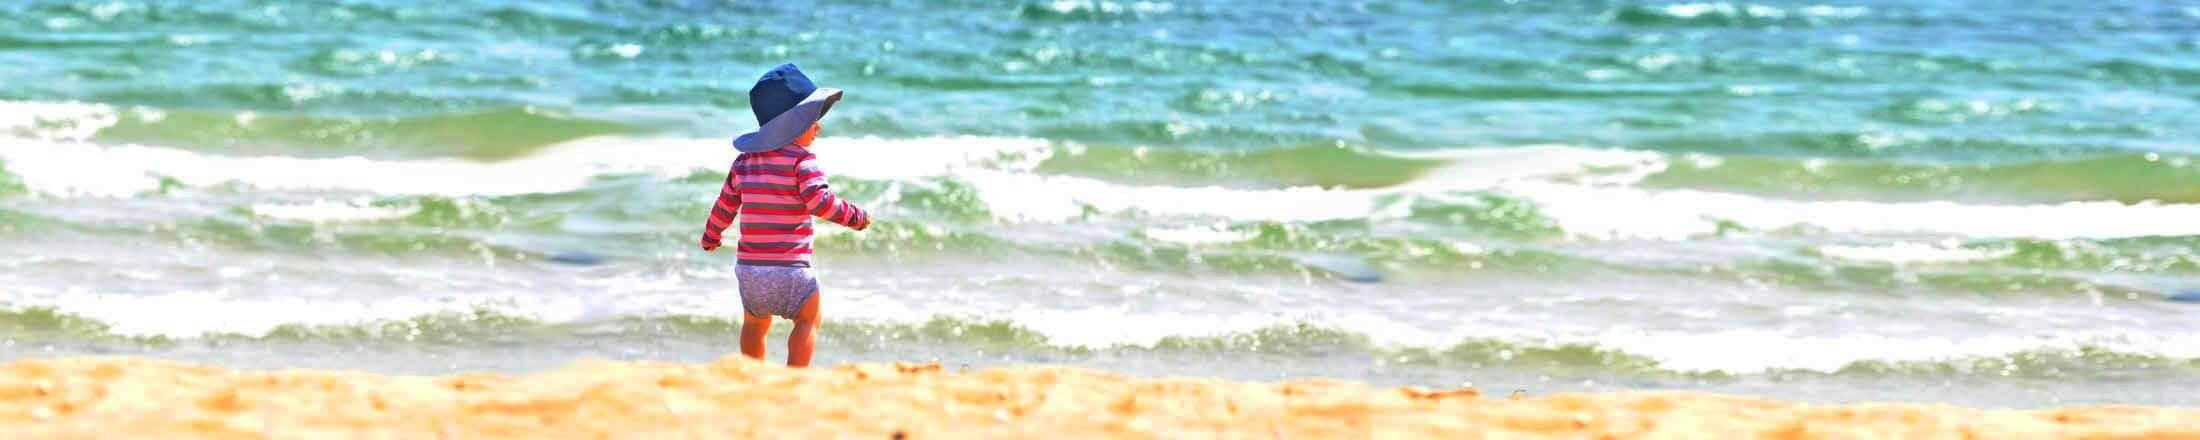 Reisebett Baby am Meer